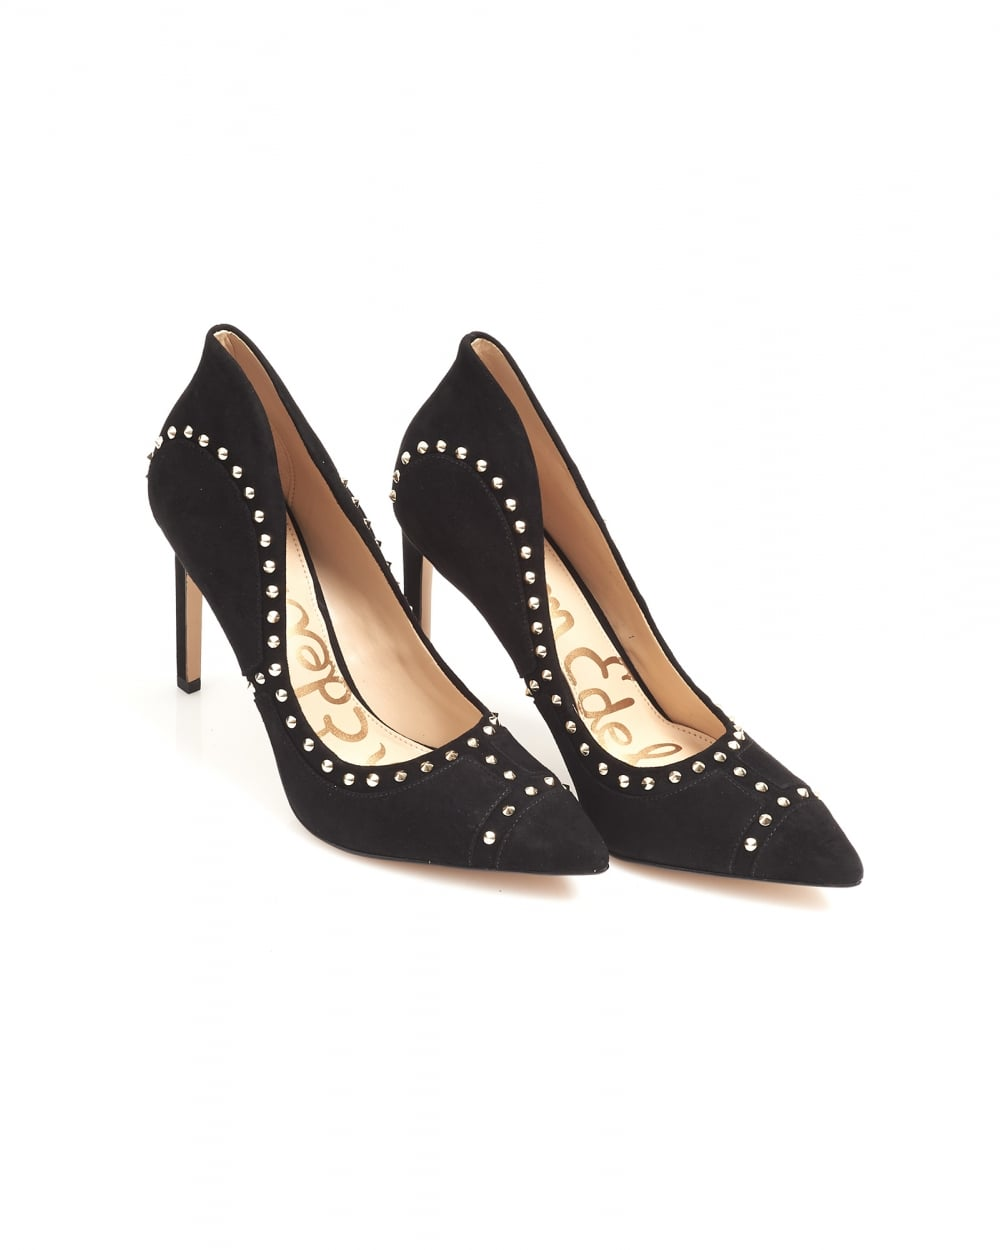 Black Studded Shoes Mens Size